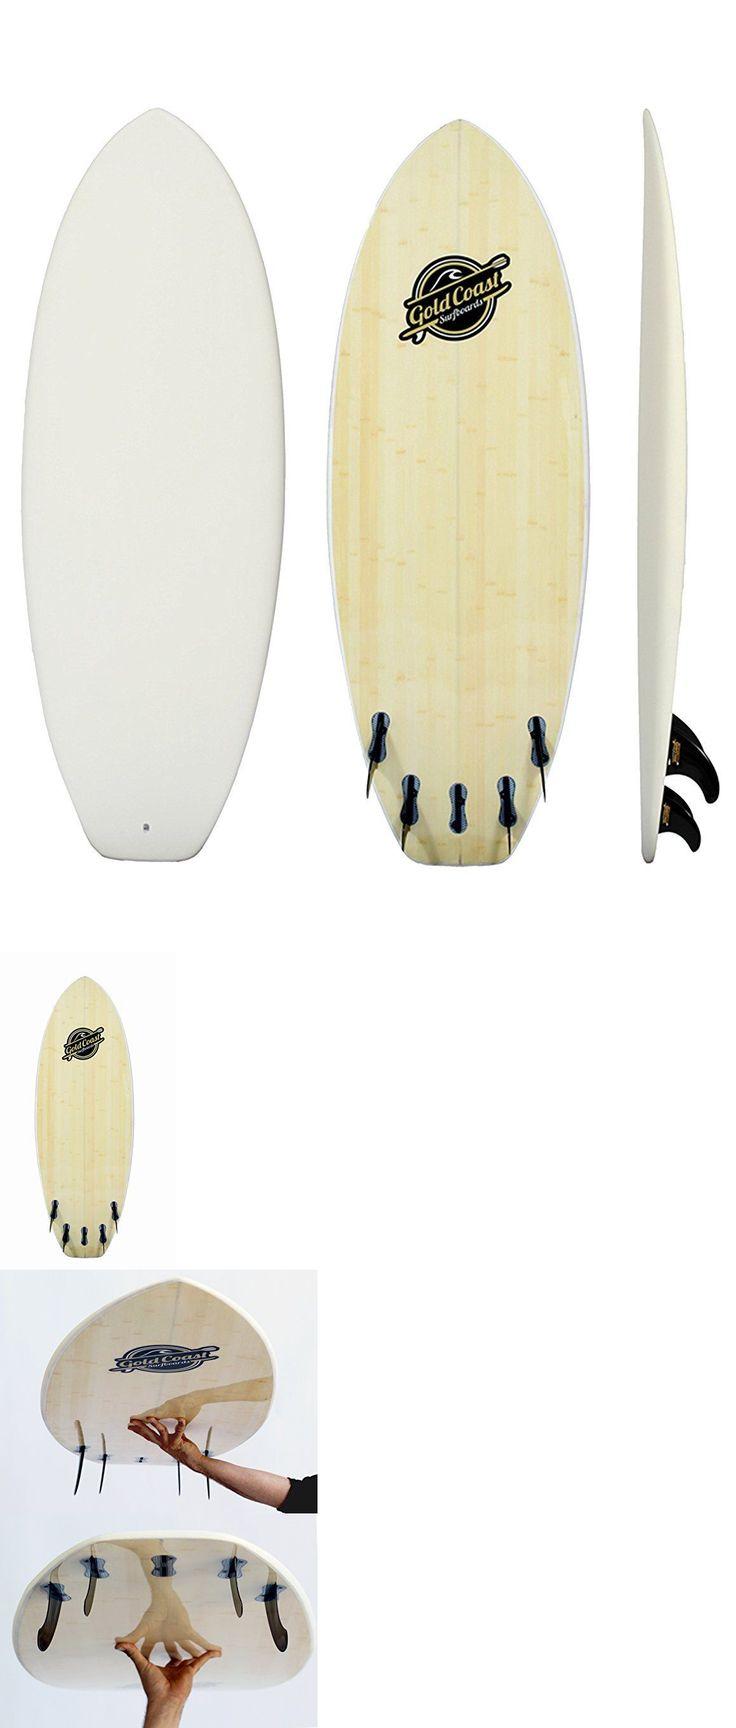 "Other Surfing 2916: 5'3"" Foam Surfboard Hybrid Soft Surfboard Surfing Shortboard Fish -> BUY IT NOW ONLY: $279.97 on eBay!"